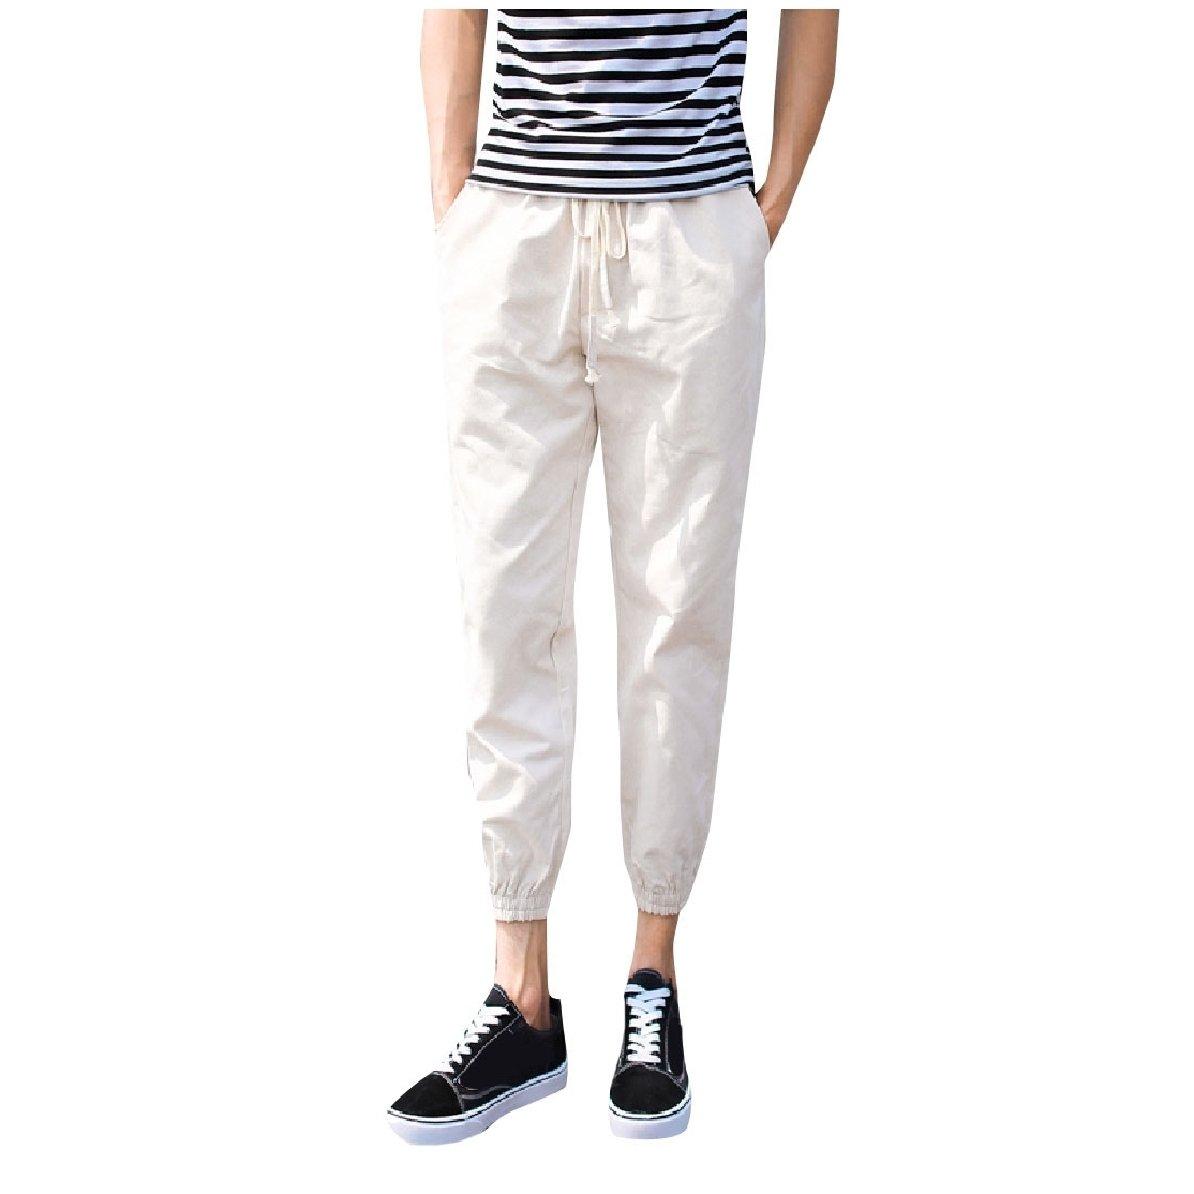 YUNY Men Elastic Waist Beam Foot Trousers Tenths Pants Beige S